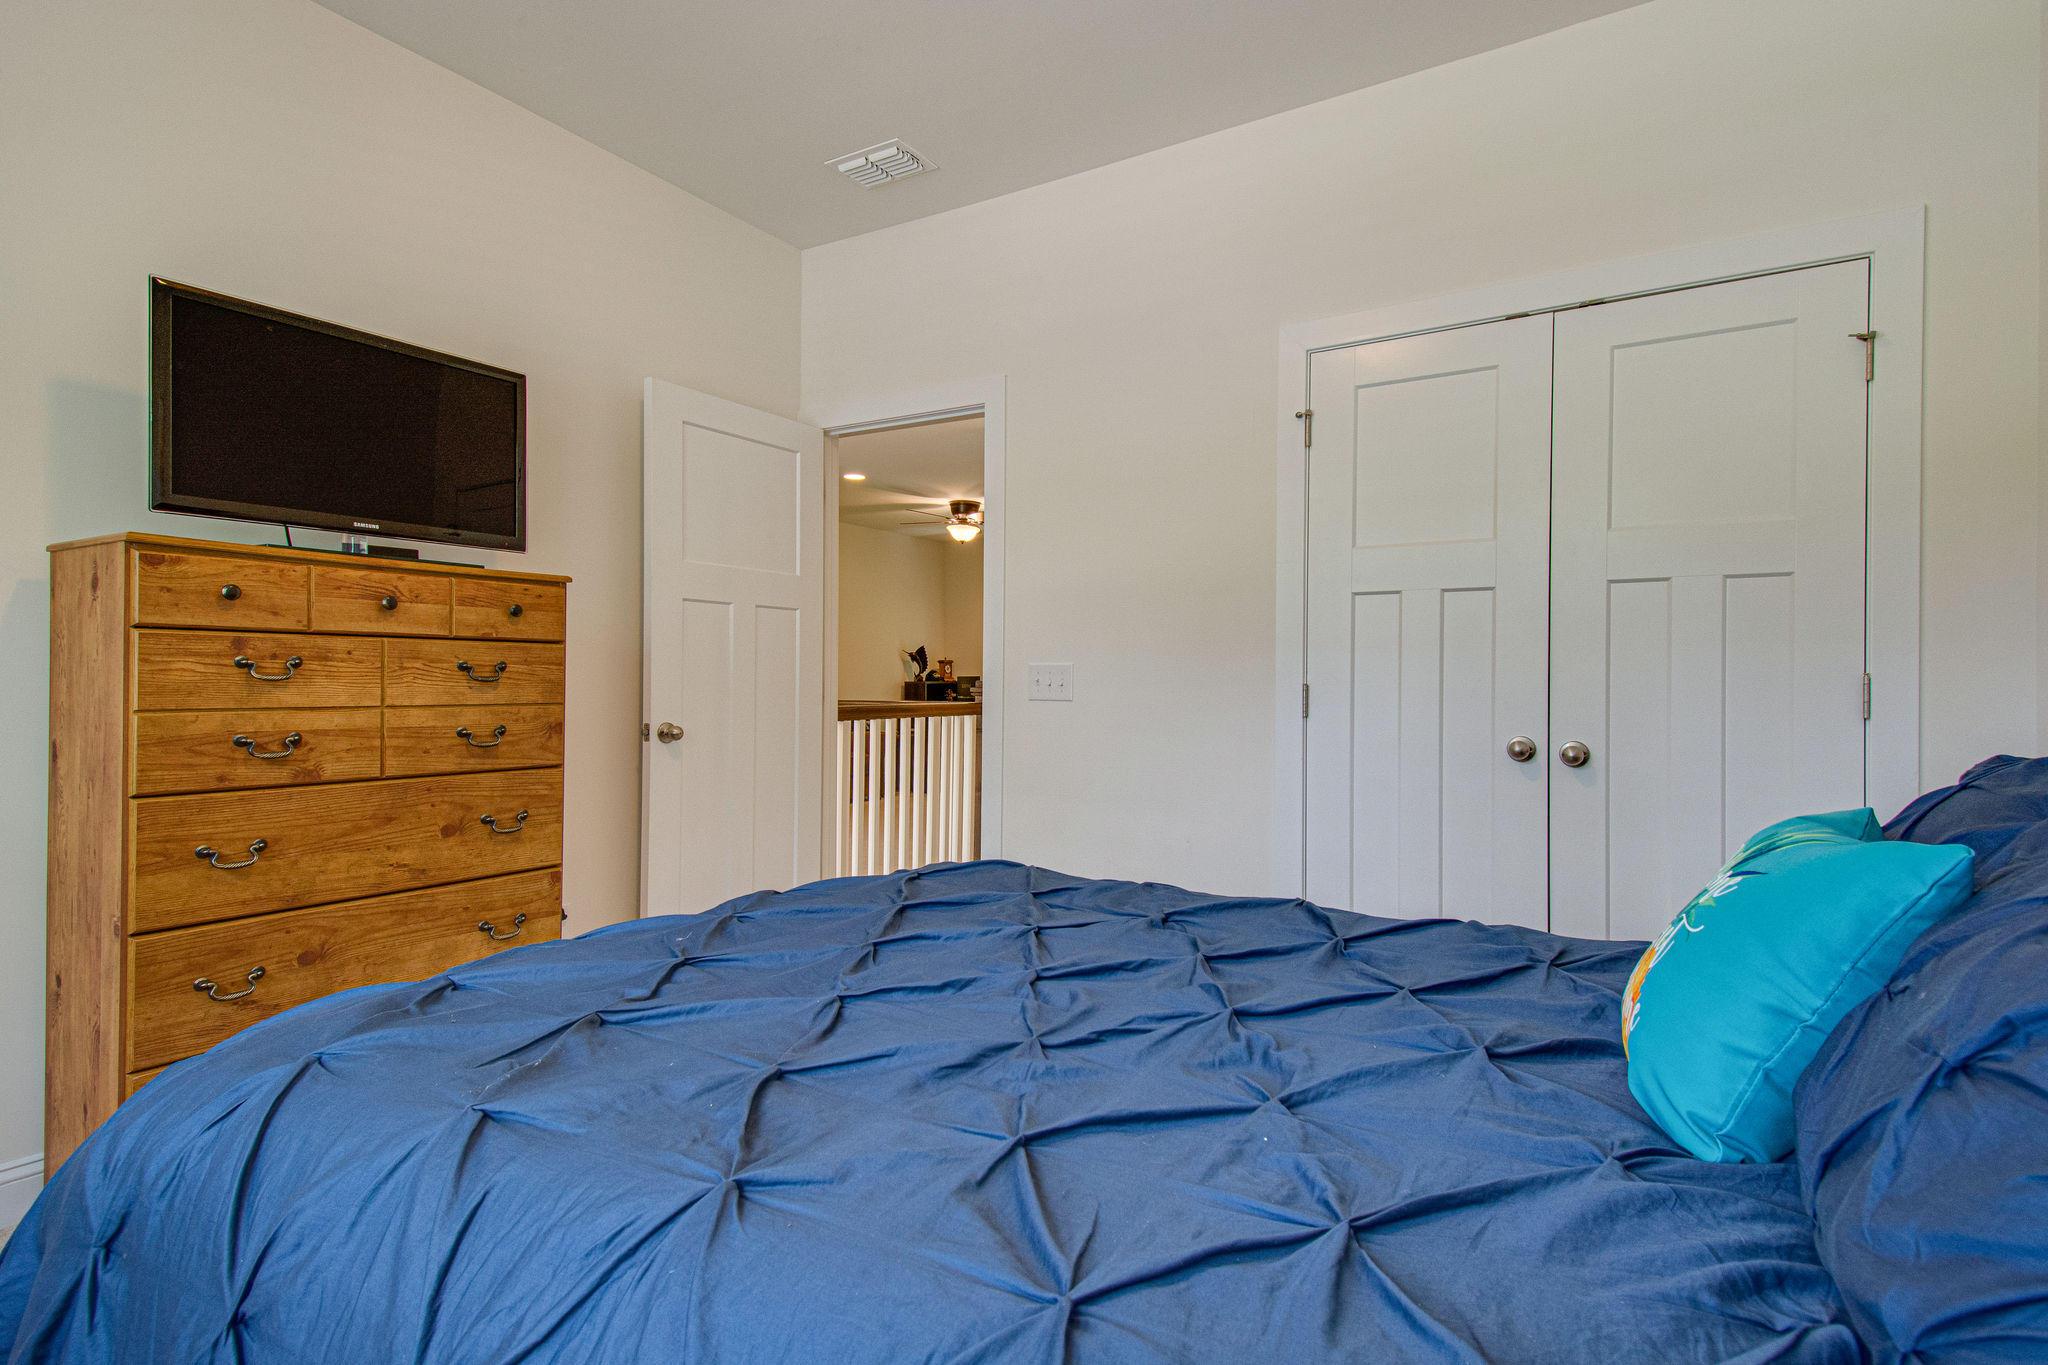 Magnolia Village Homes For Sale - 1261 Pearwood, Mount Pleasant, SC - 20